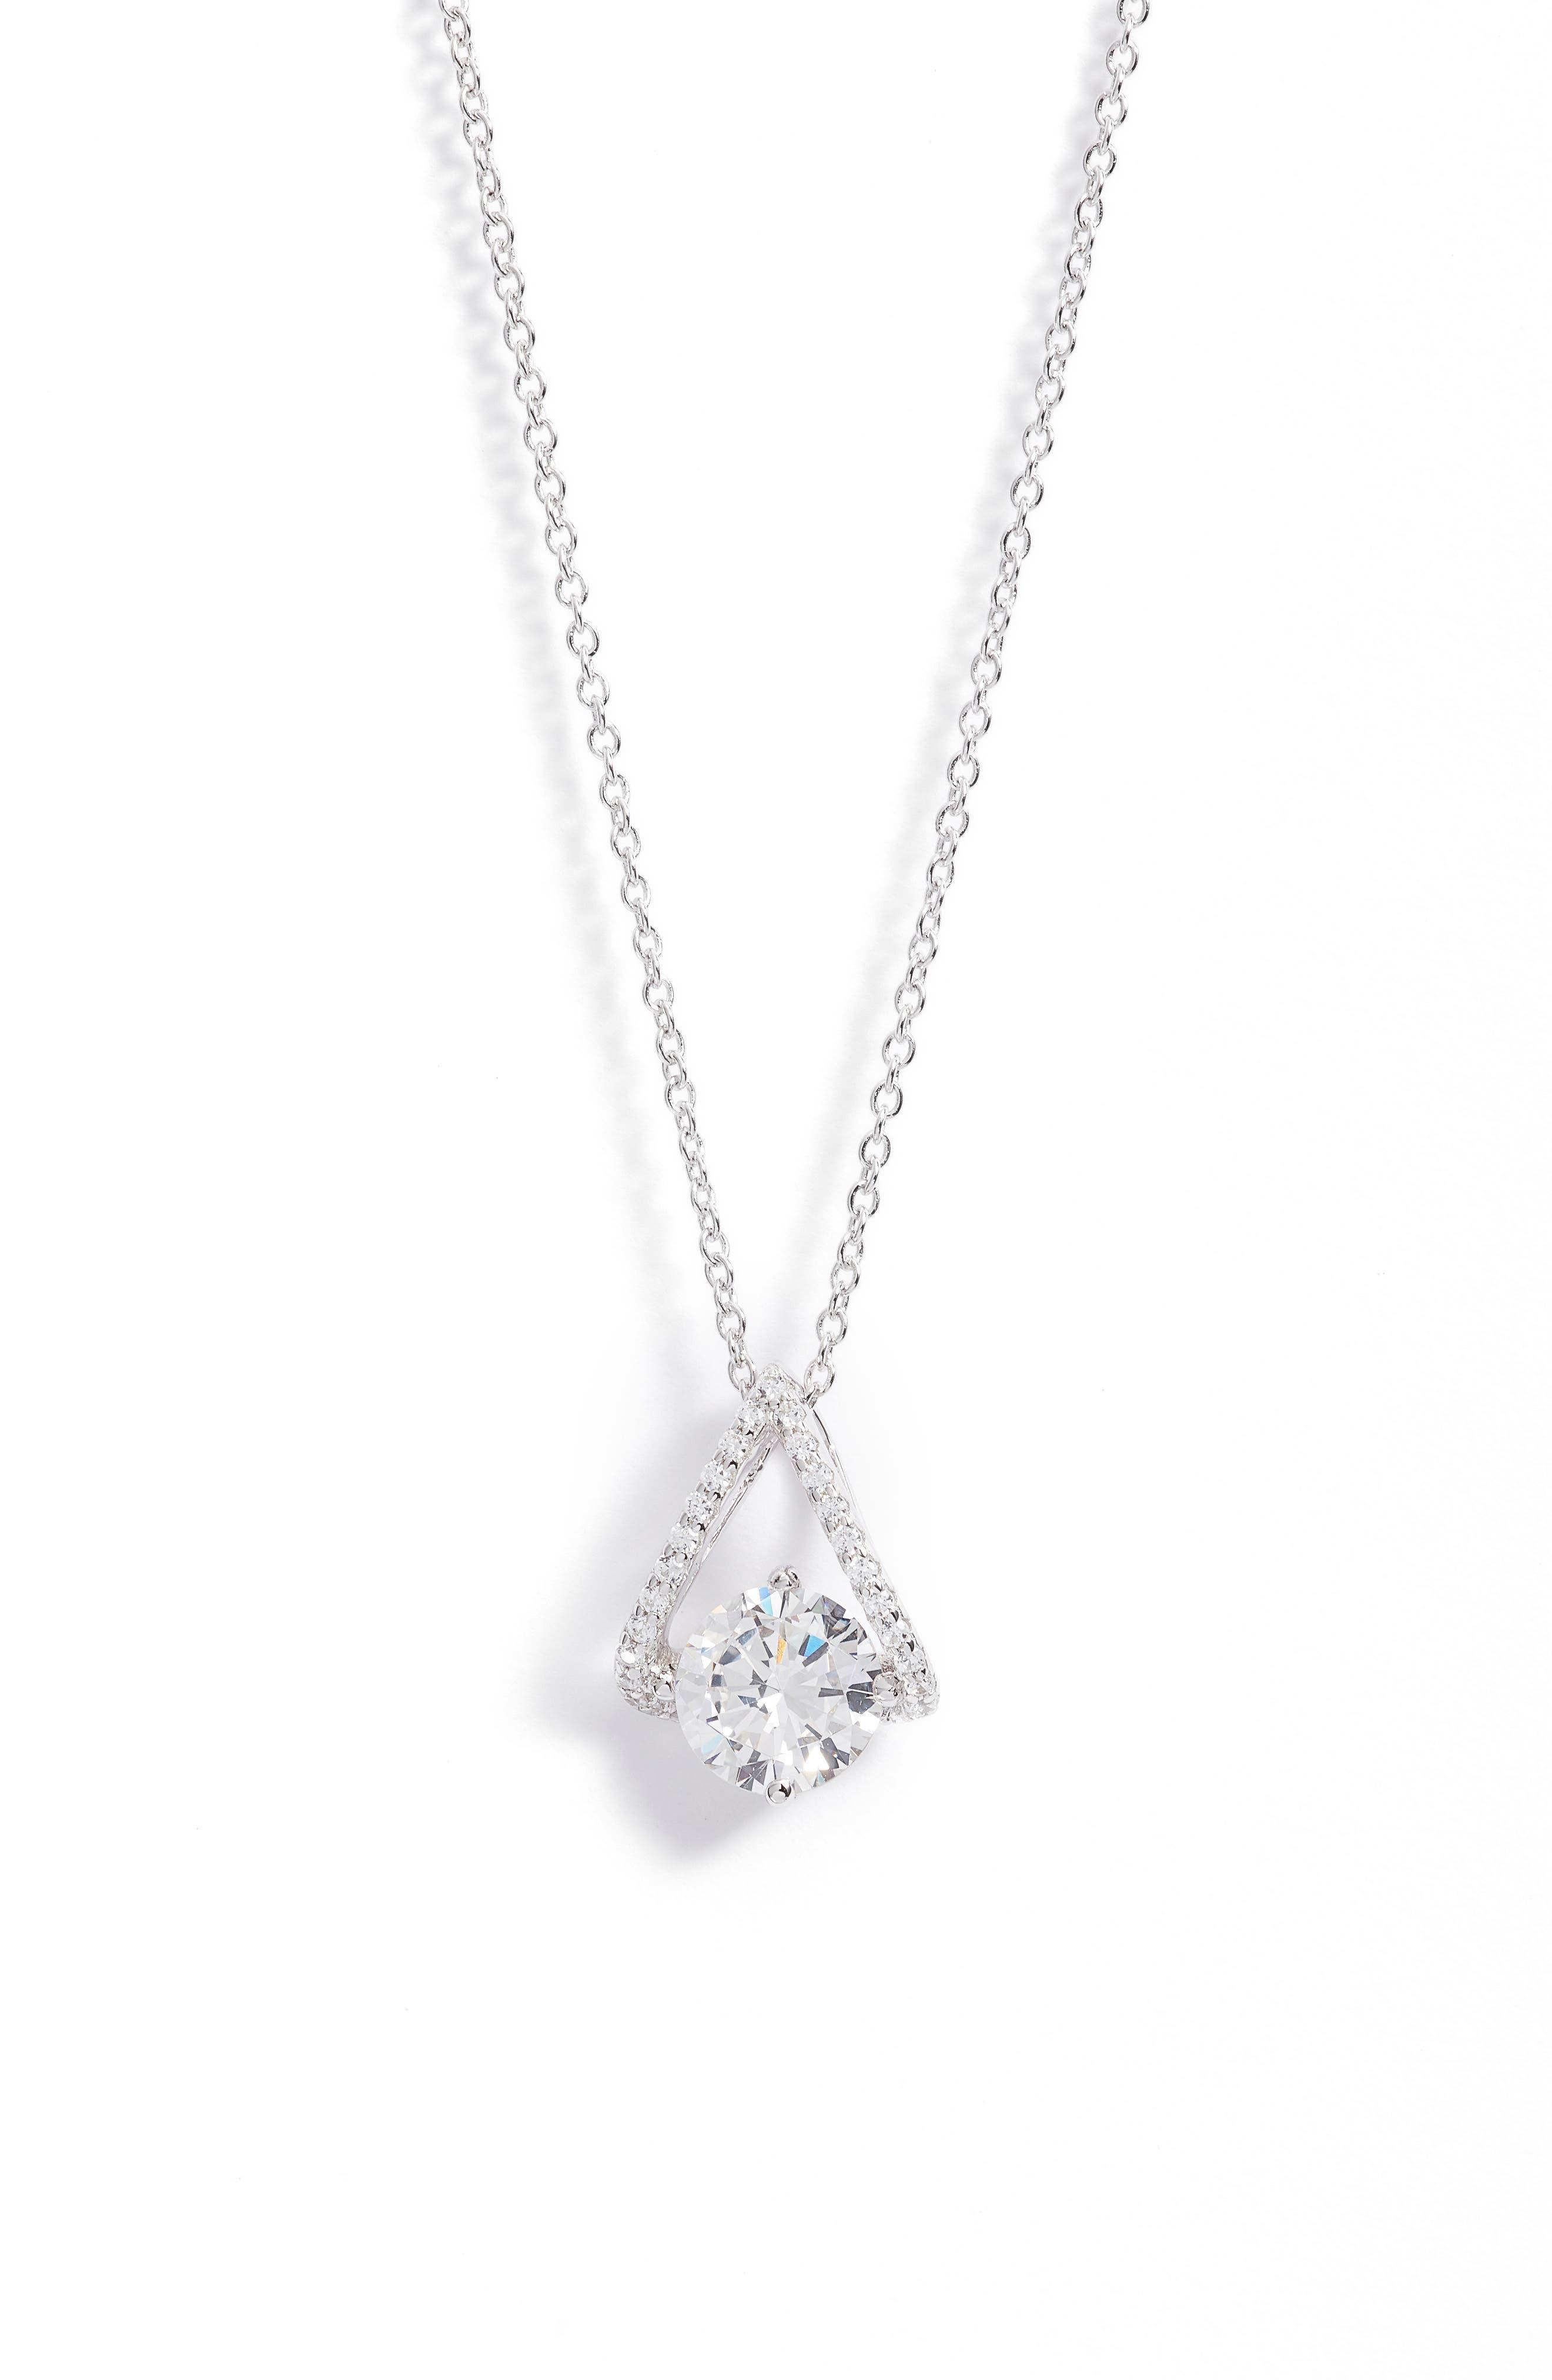 Simulated Diamond Pendant Necklace